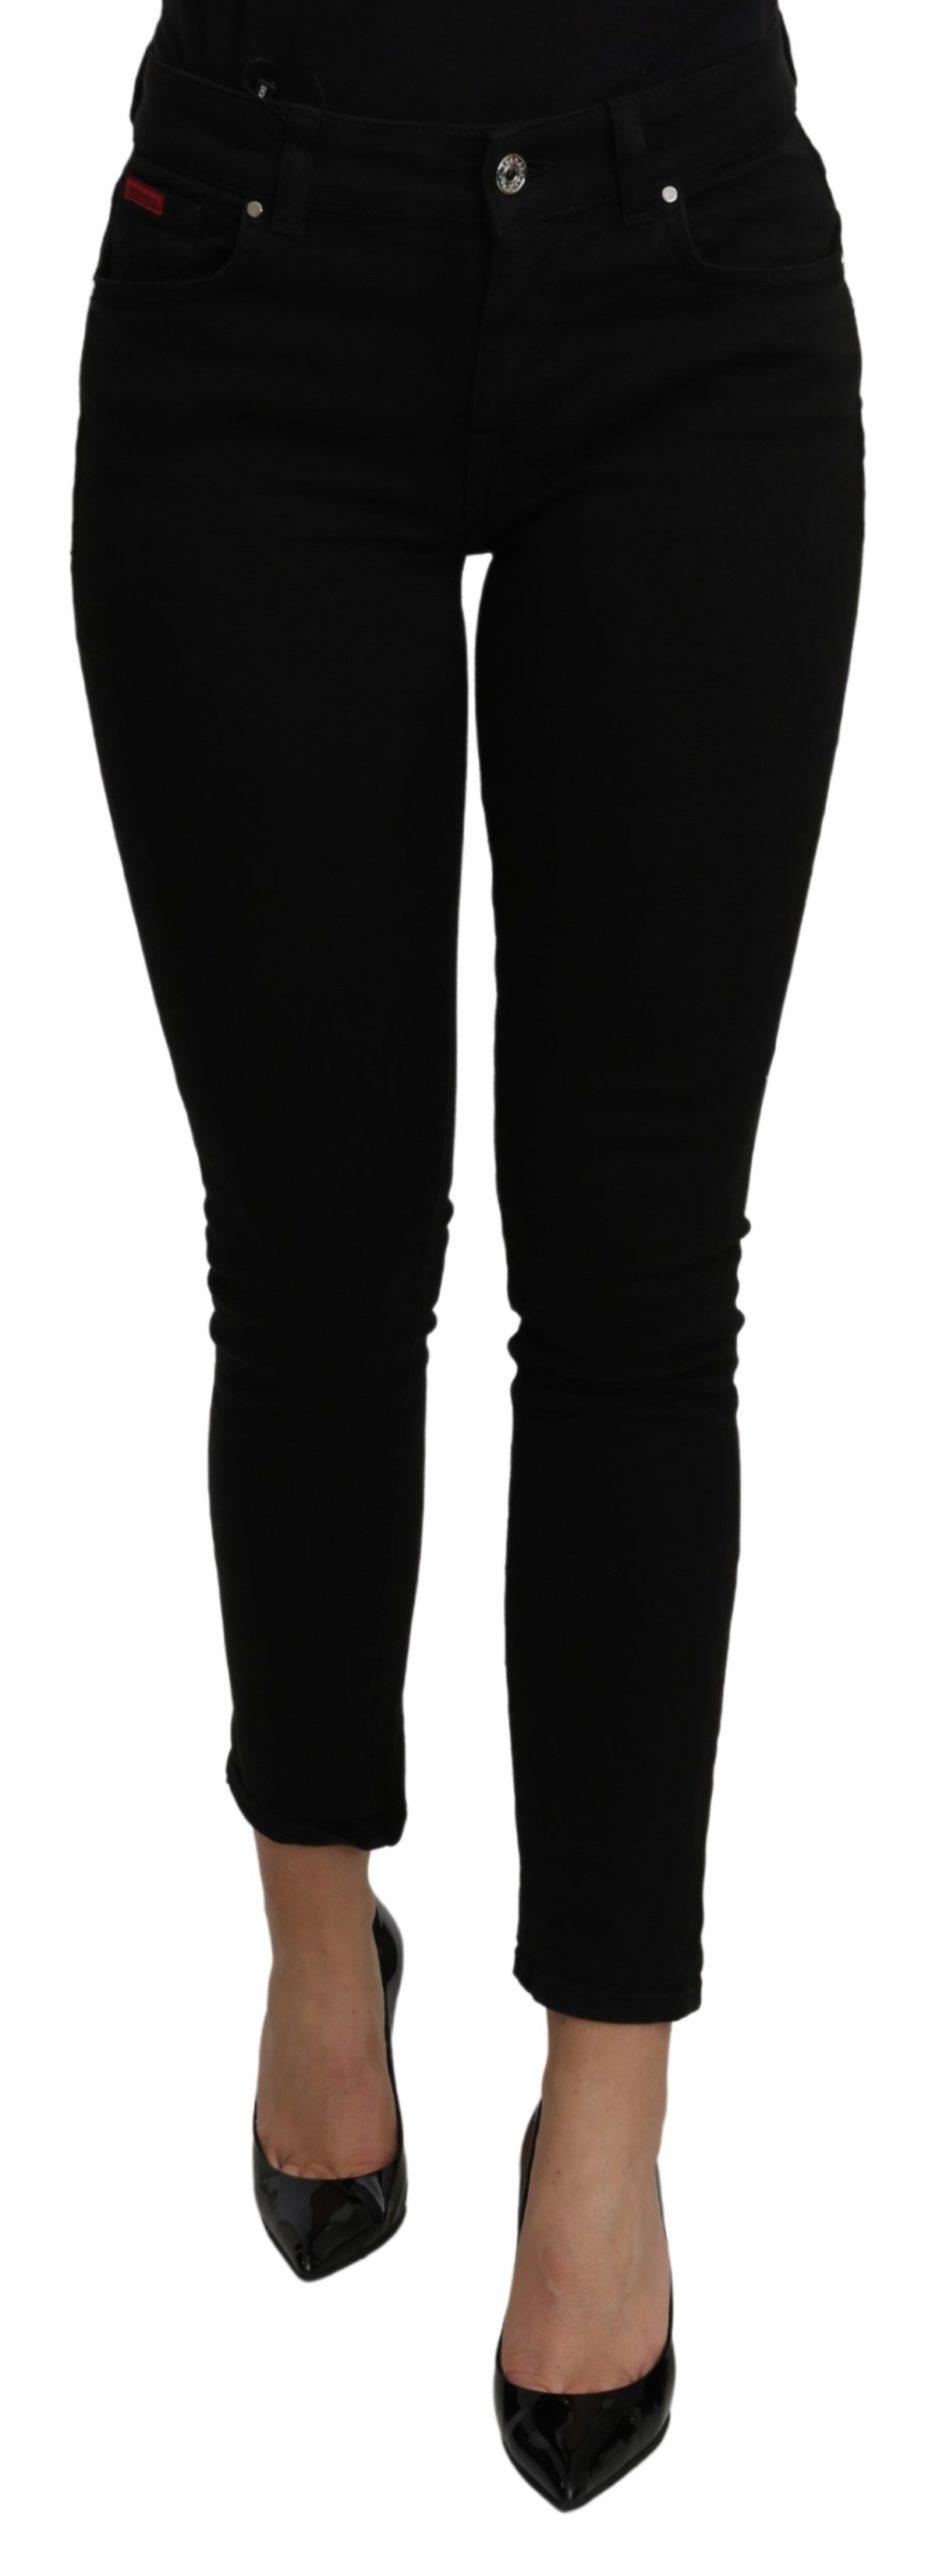 Dolce & Gabbana Women's Mid Waist Slim Cotton Jeans Black PAN71117 - IT38|XS